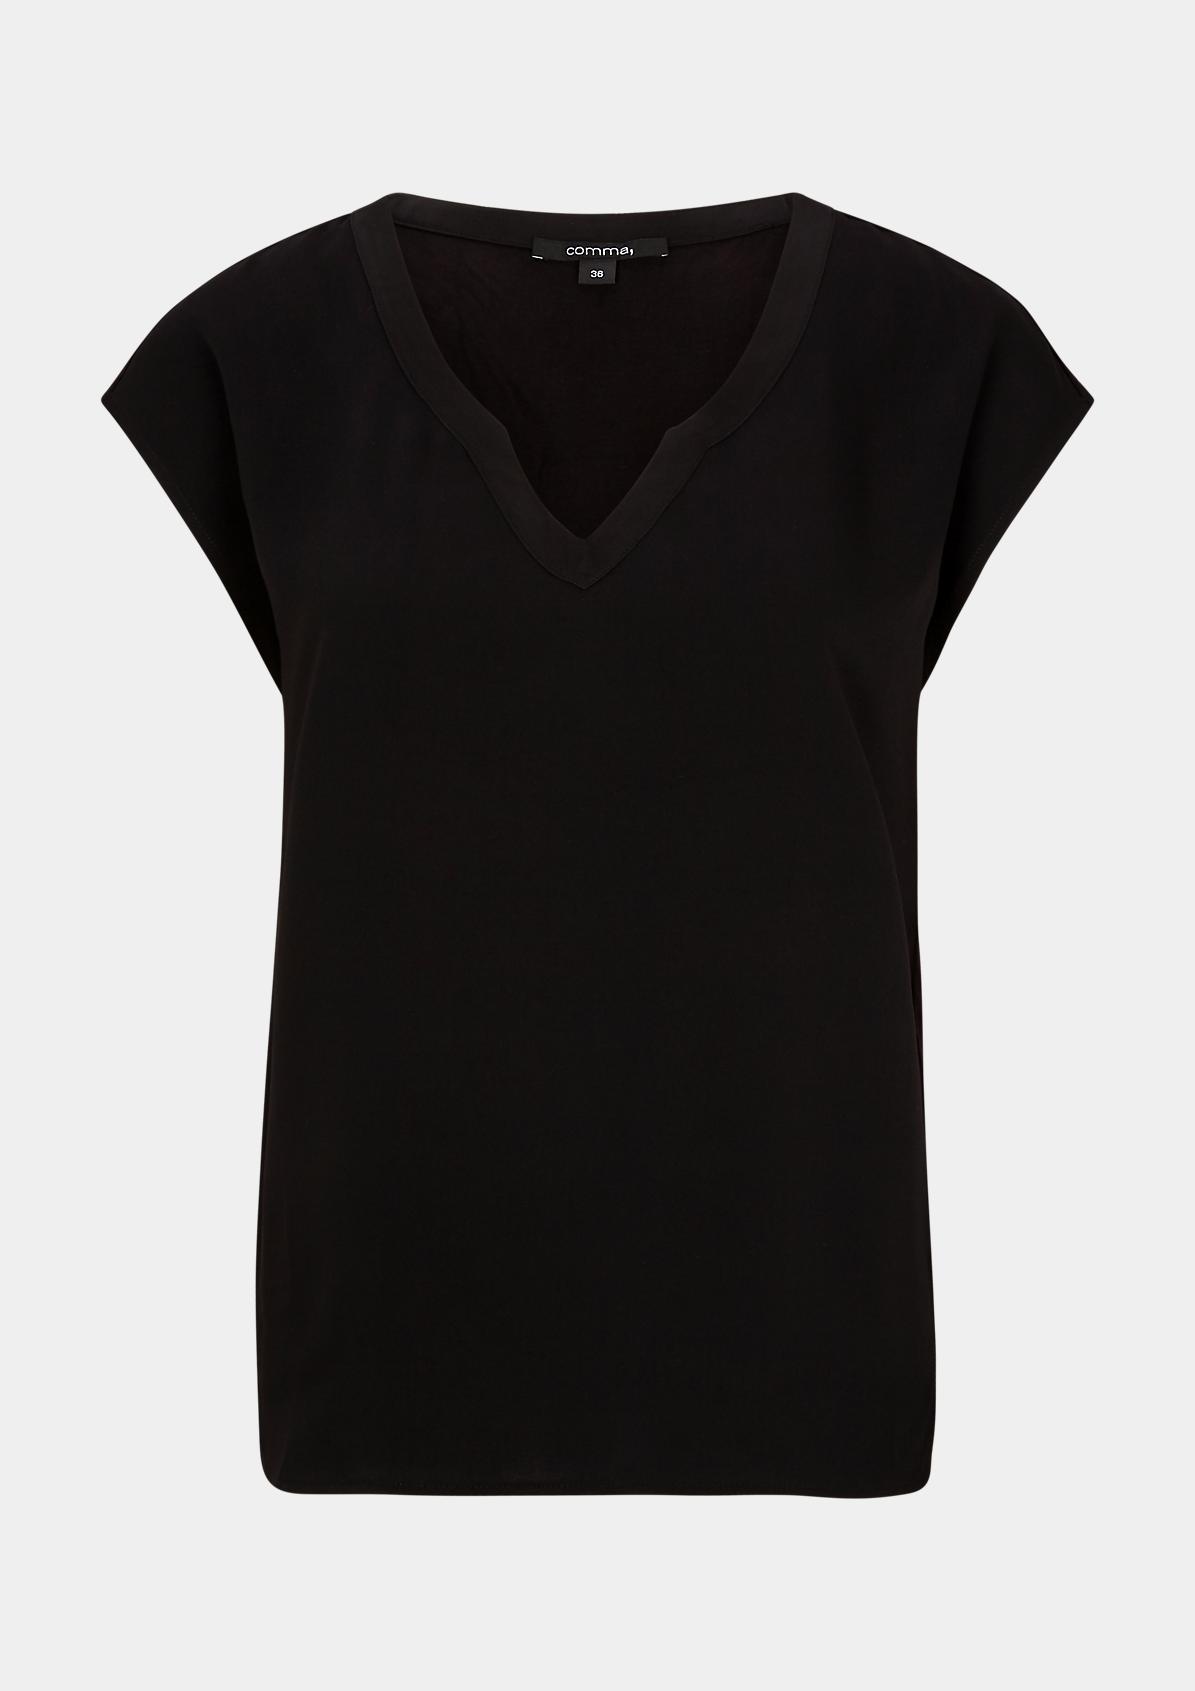 Materialmix-Shirt mit Satinblende